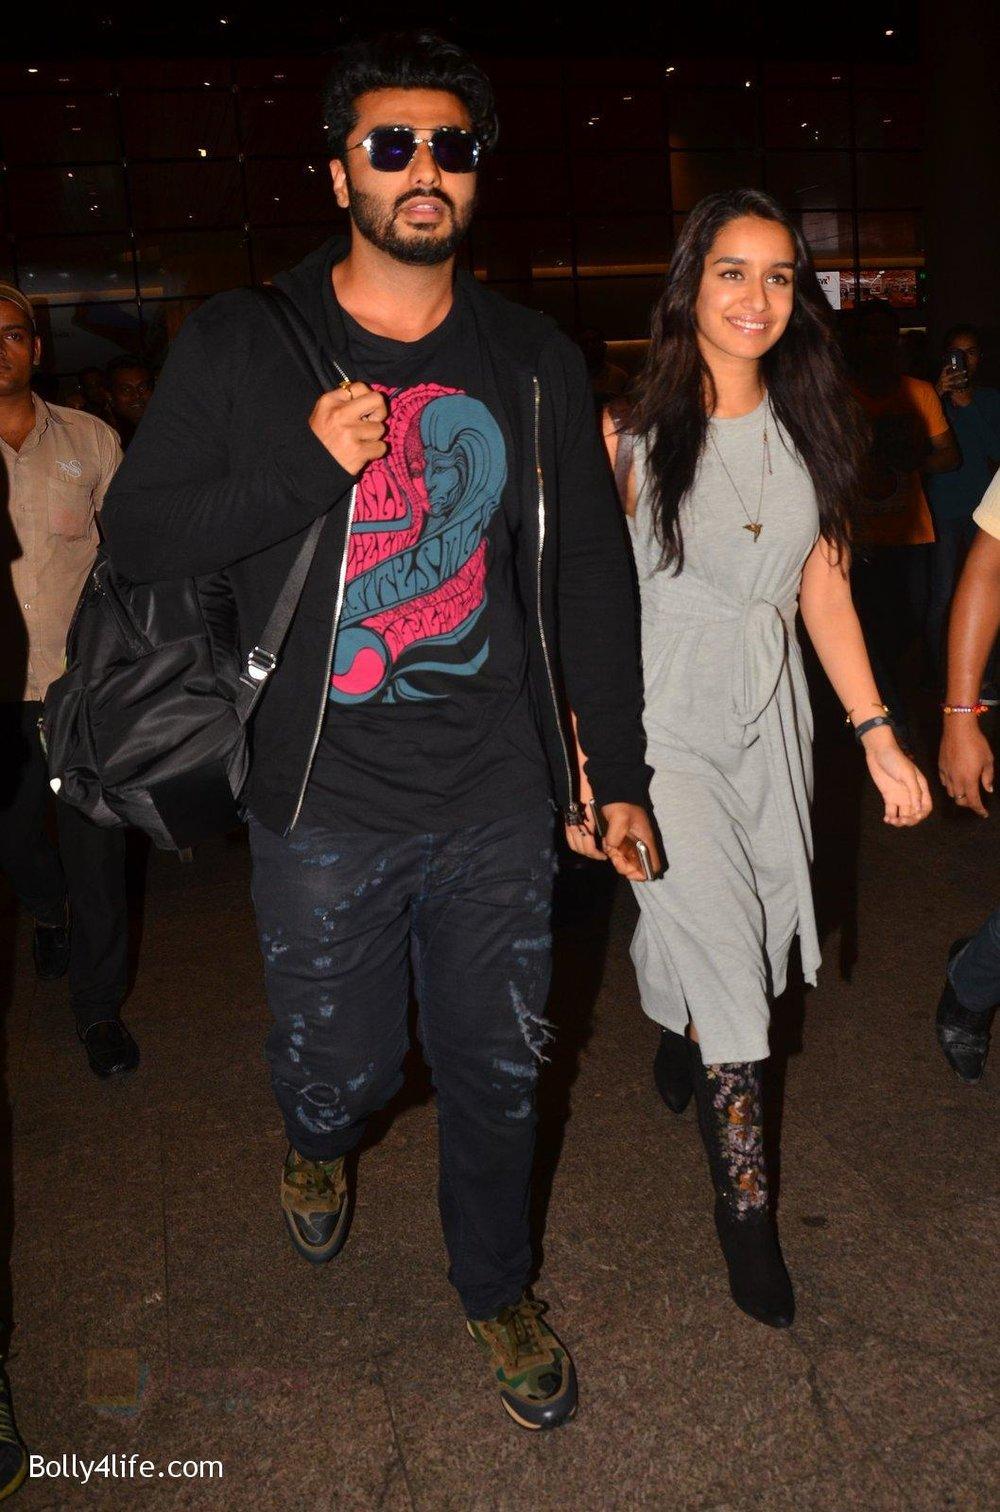 Shraddha-Kapoor-and-Arjun-Kapoor-return-from-NY-on-15th-Sept-2016-31.jpg